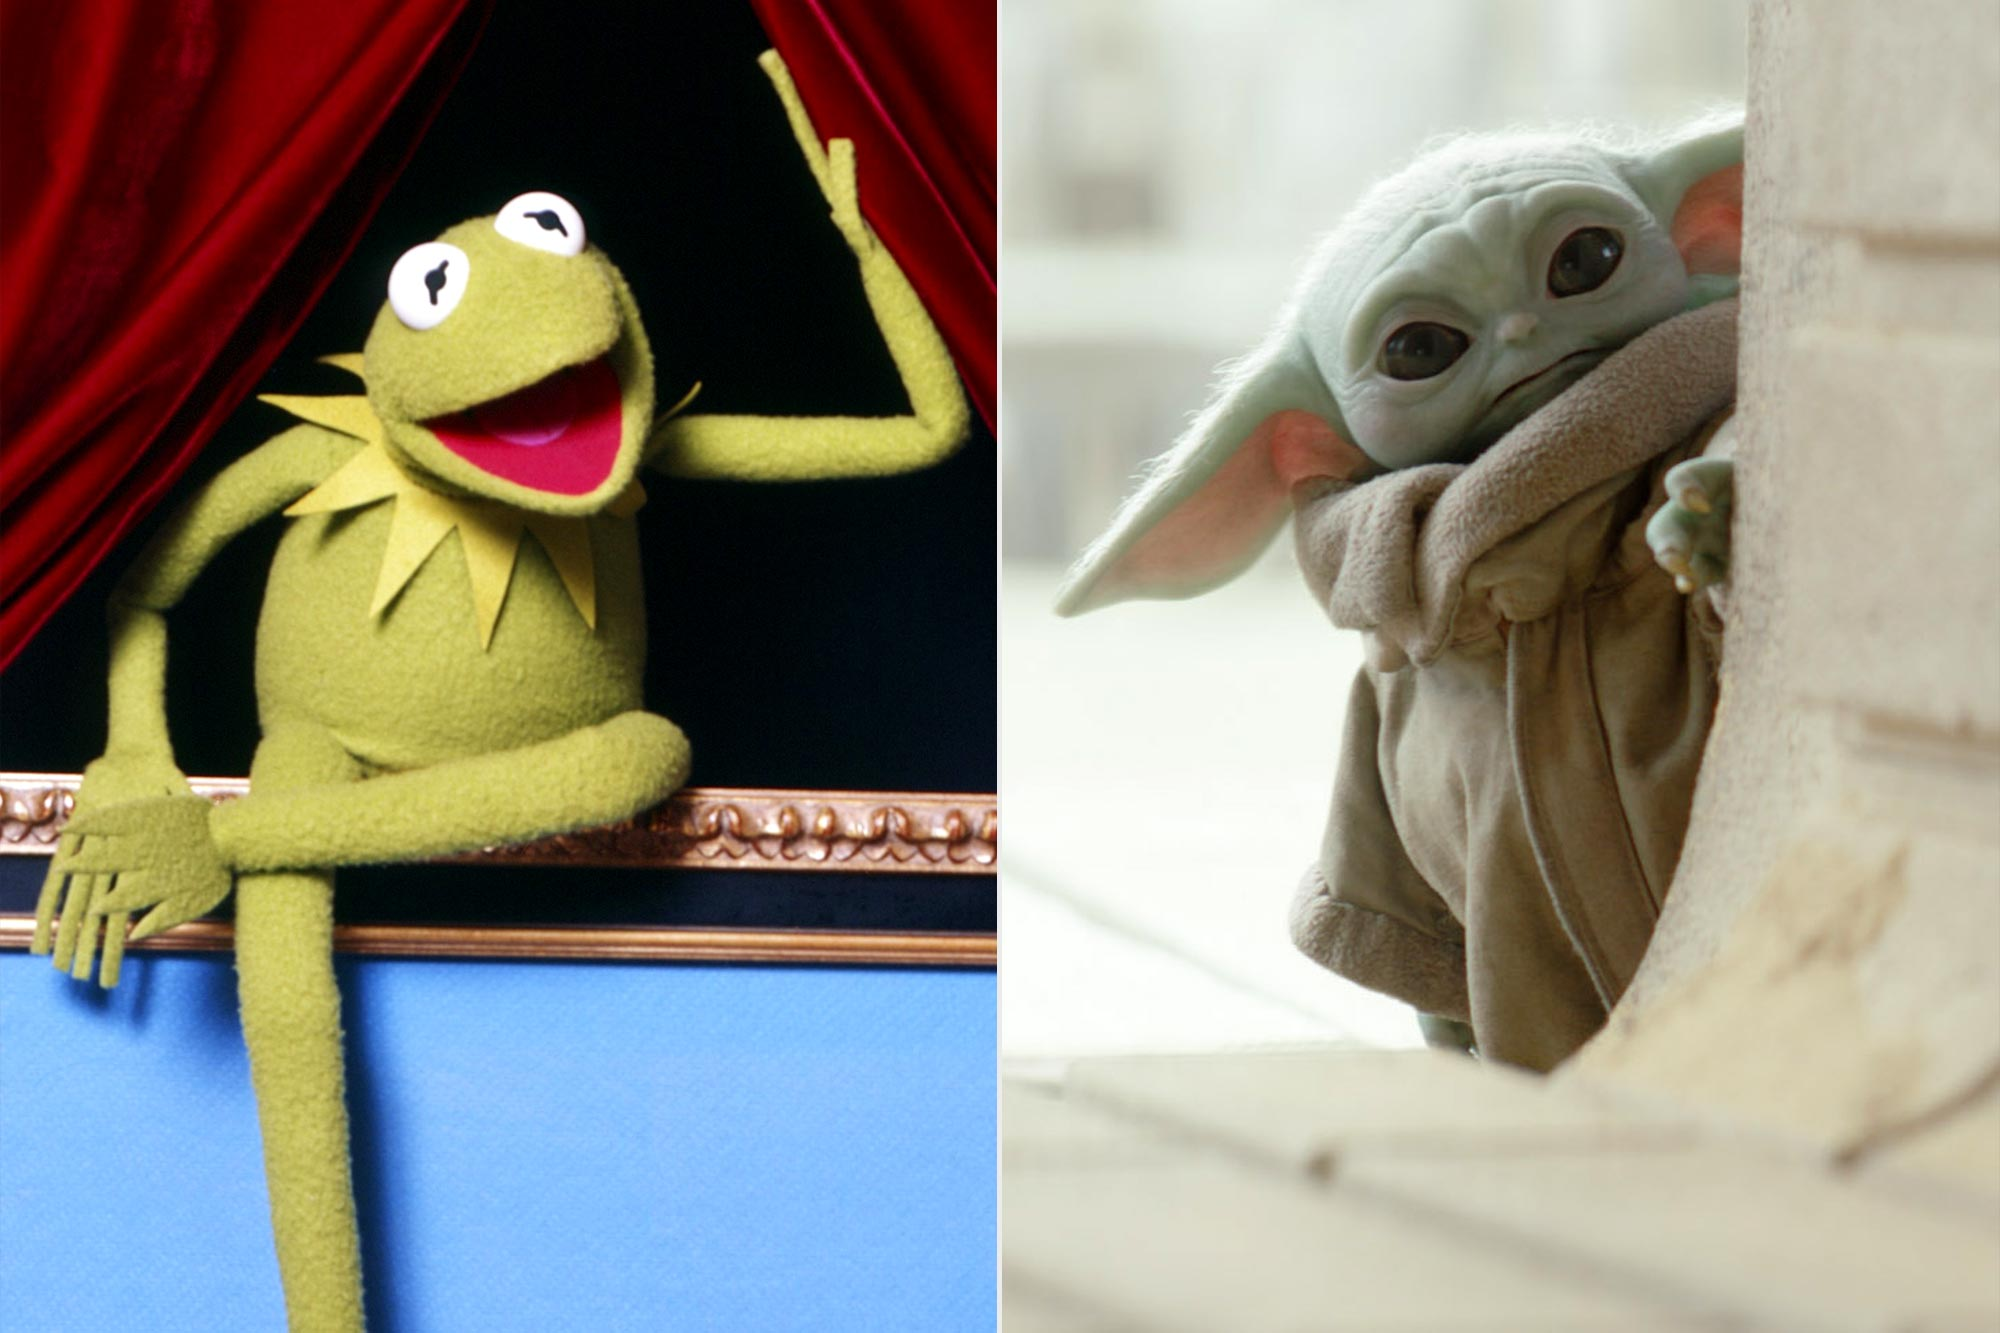 Kermit the Frog; Baby Yoda